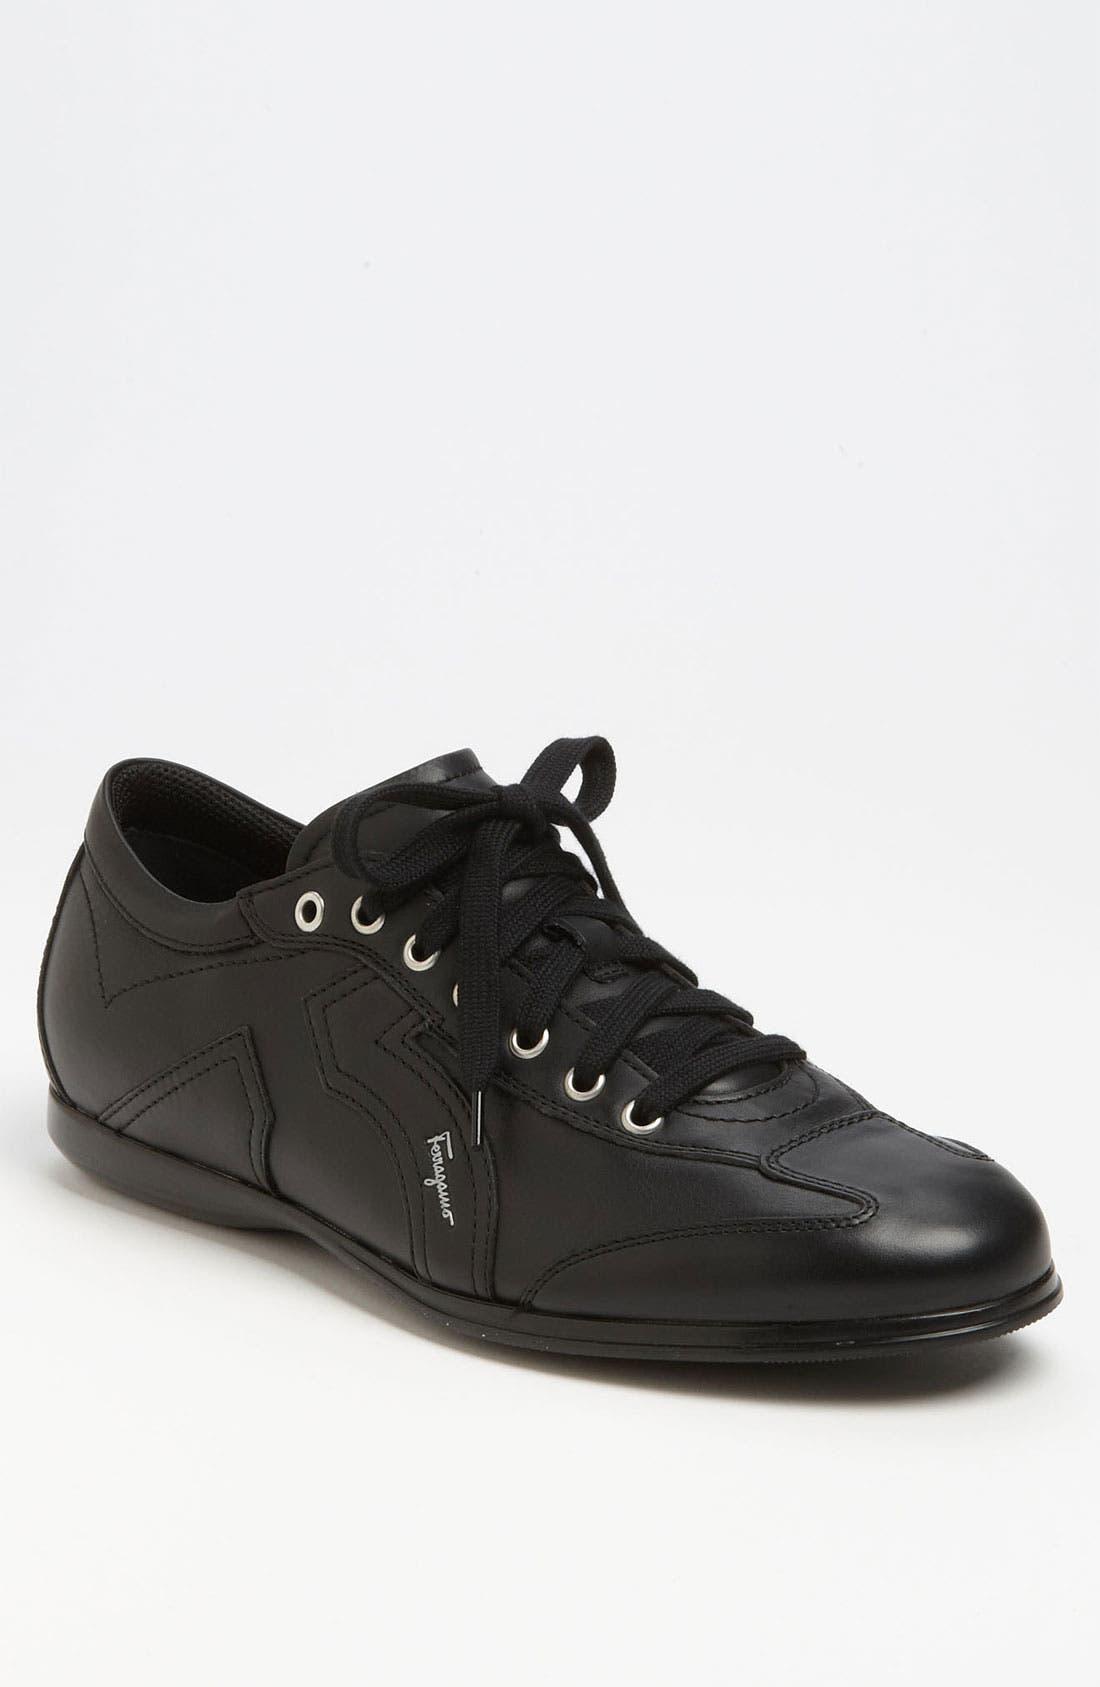 Main Image - Salvatore Ferragamo 'Millie 6' Sneaker